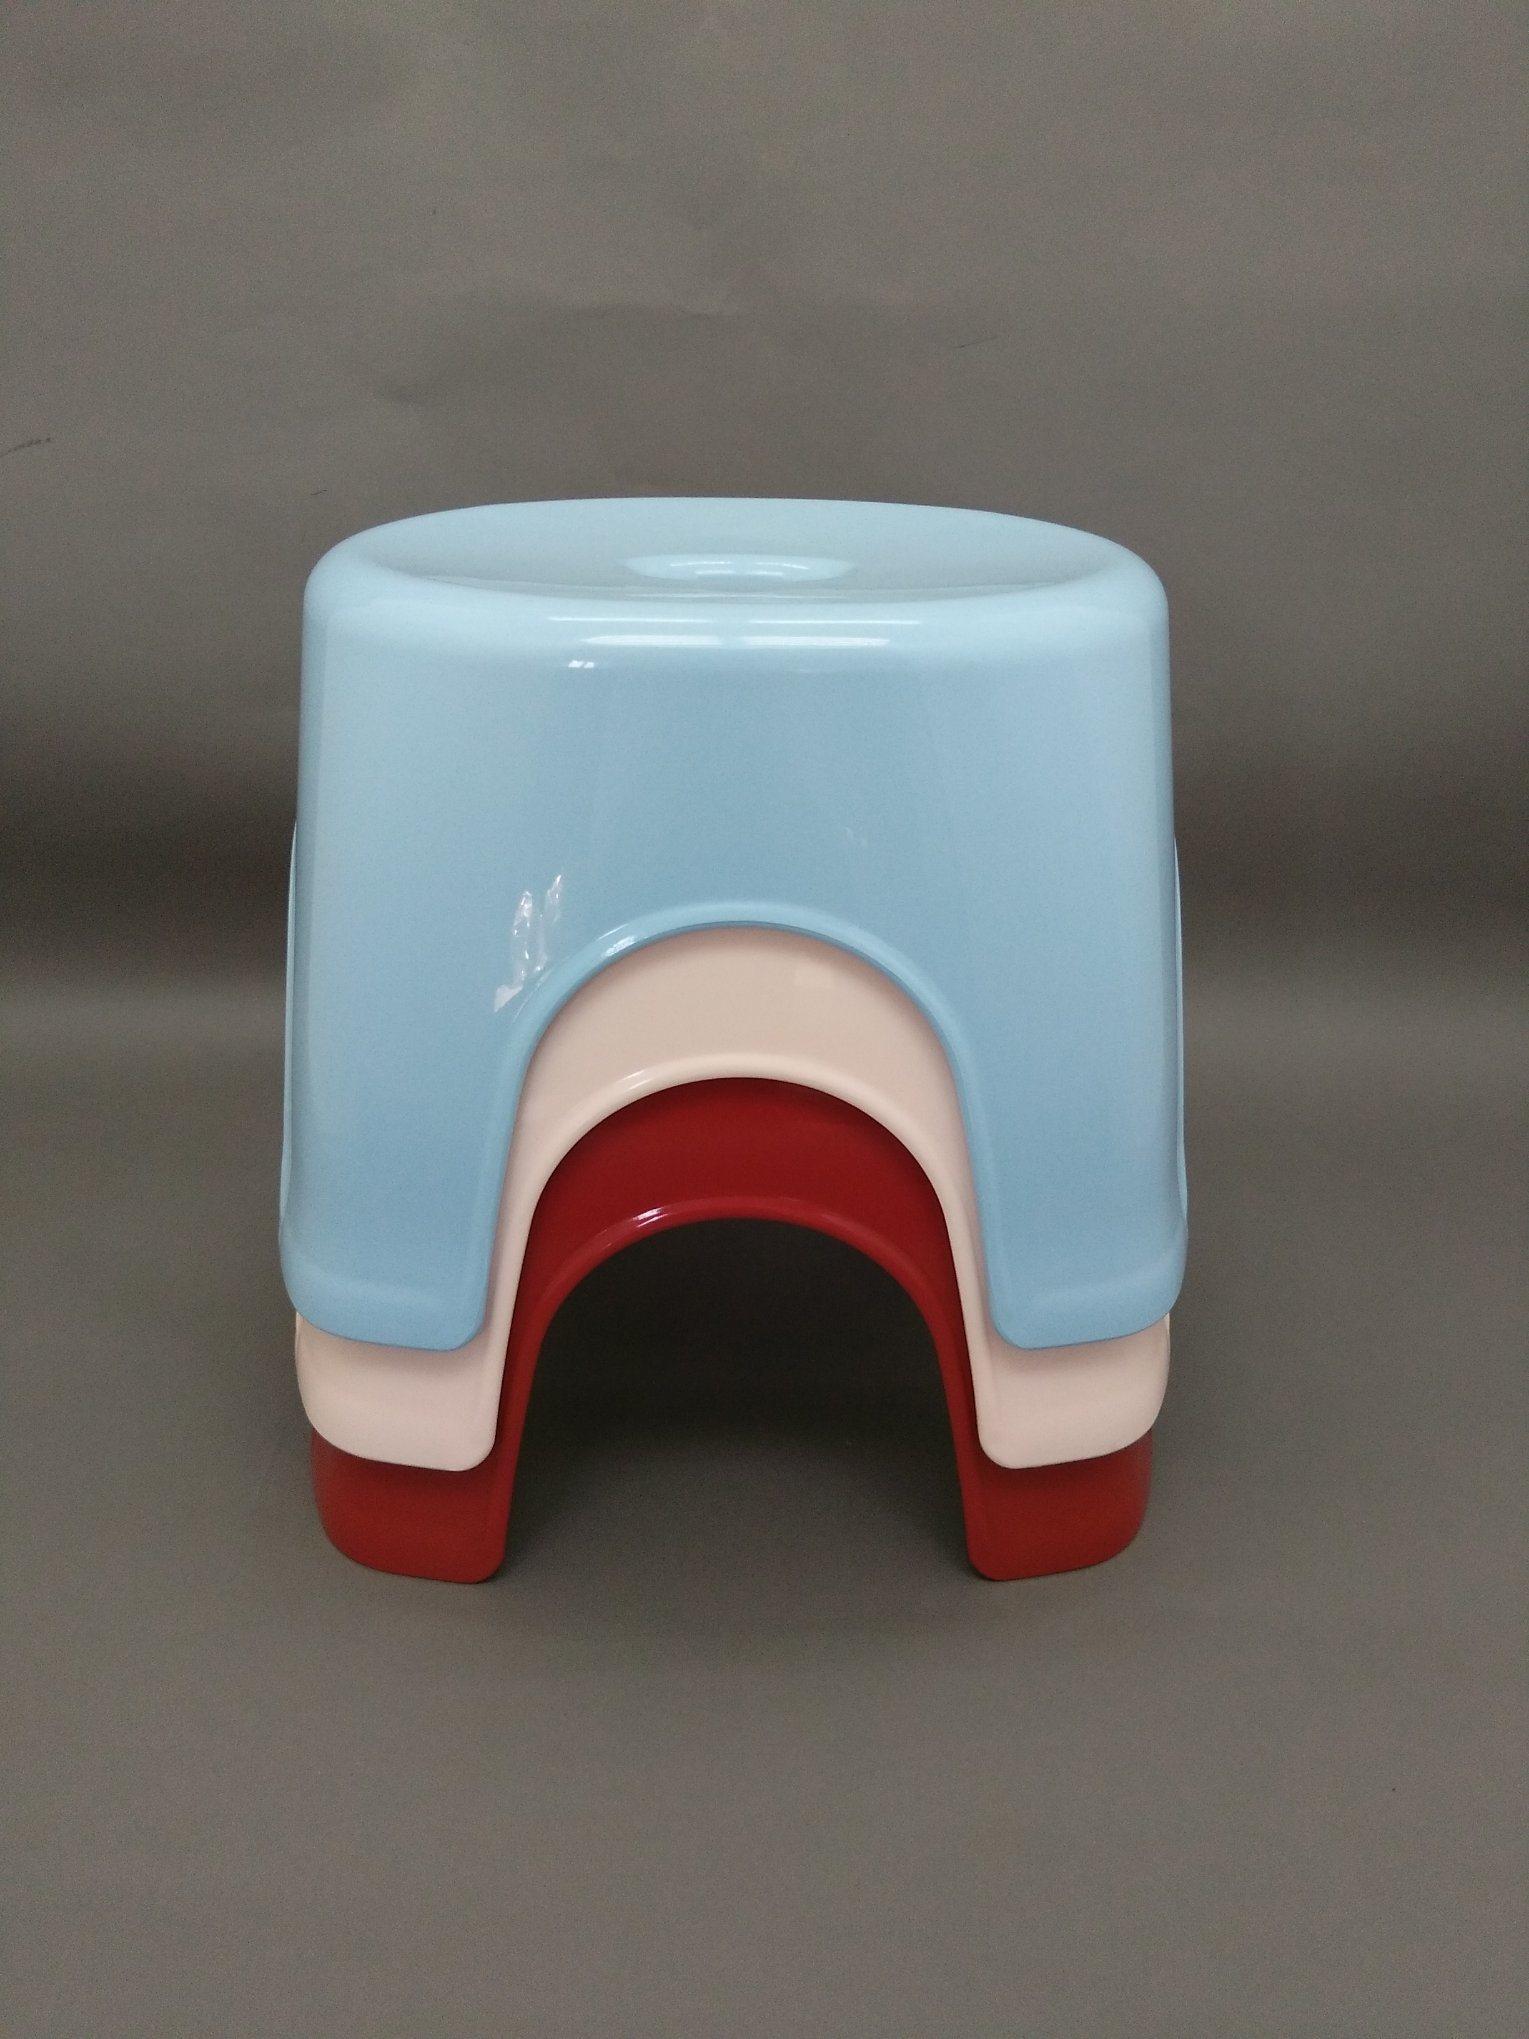 100% New PP, Colored Bathroom Plastic Stool